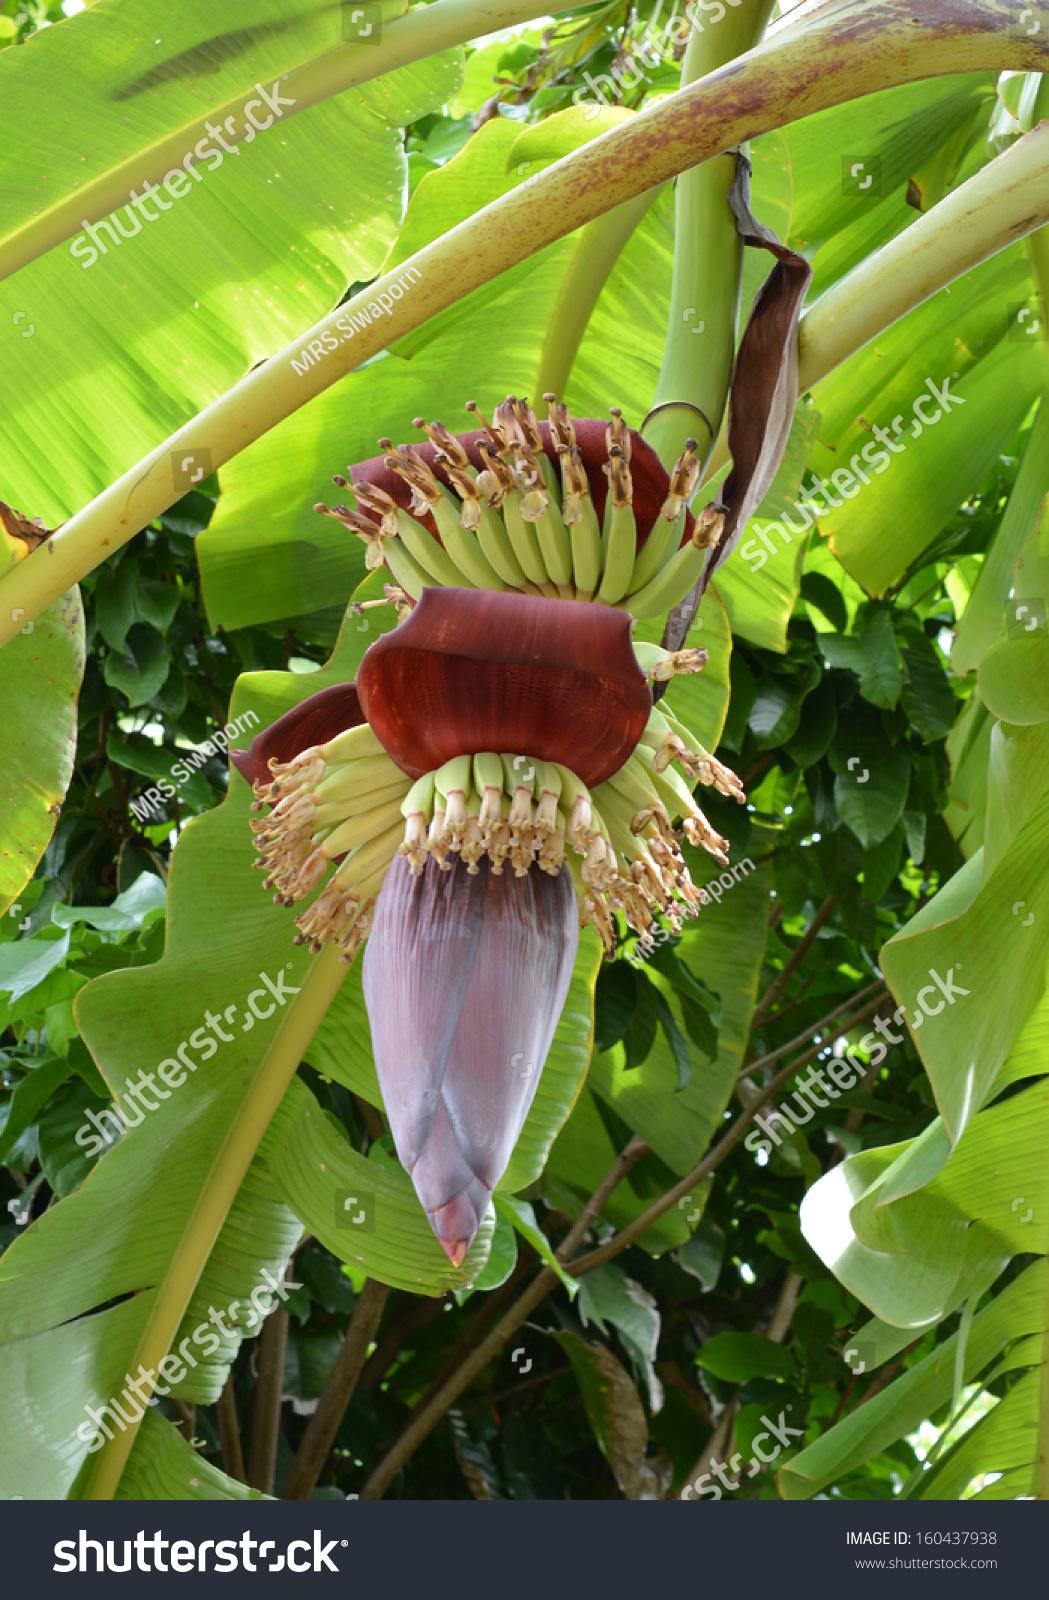 Red Banana Blossom See The Small Green Bananas Stock Photo 160437938 : Shutterstock